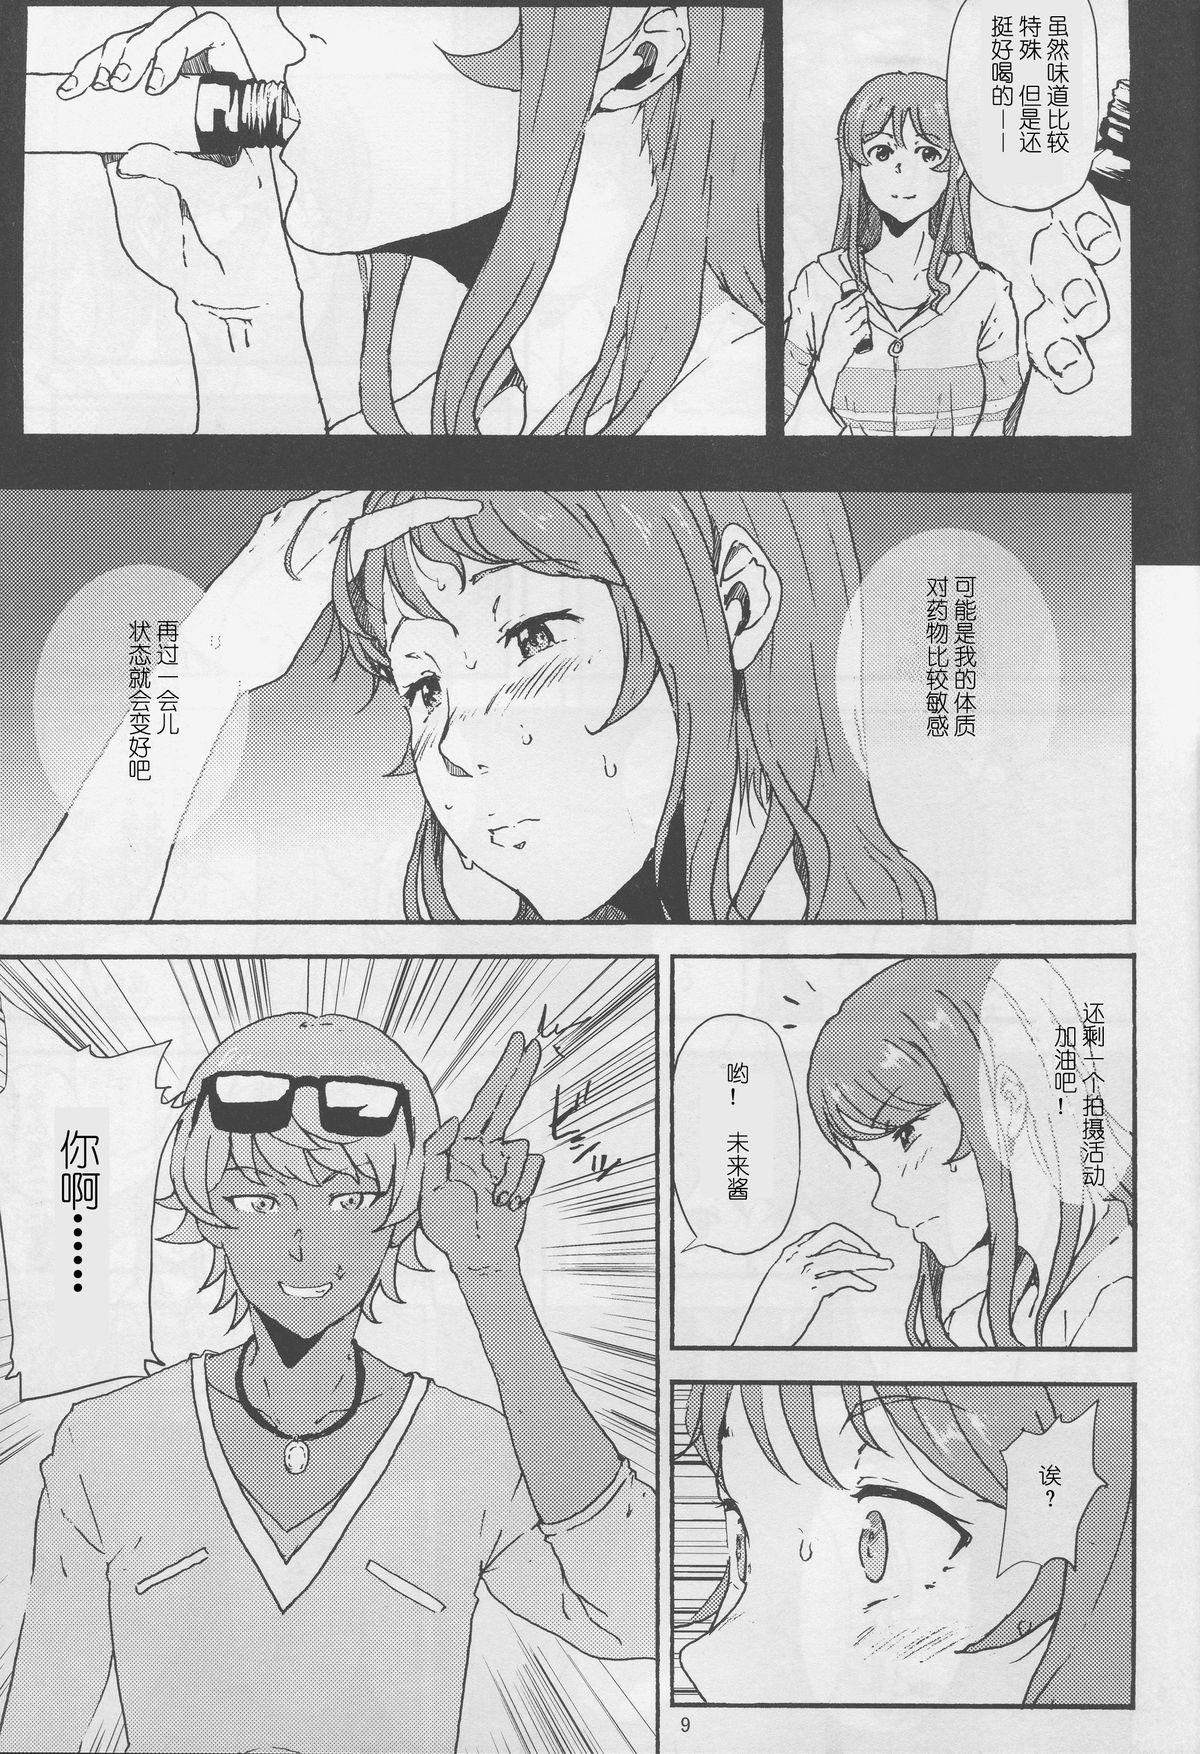 Mirai-chan ga Sandaime SGOCK no Leader ni Damasare Yarechau Hon 9